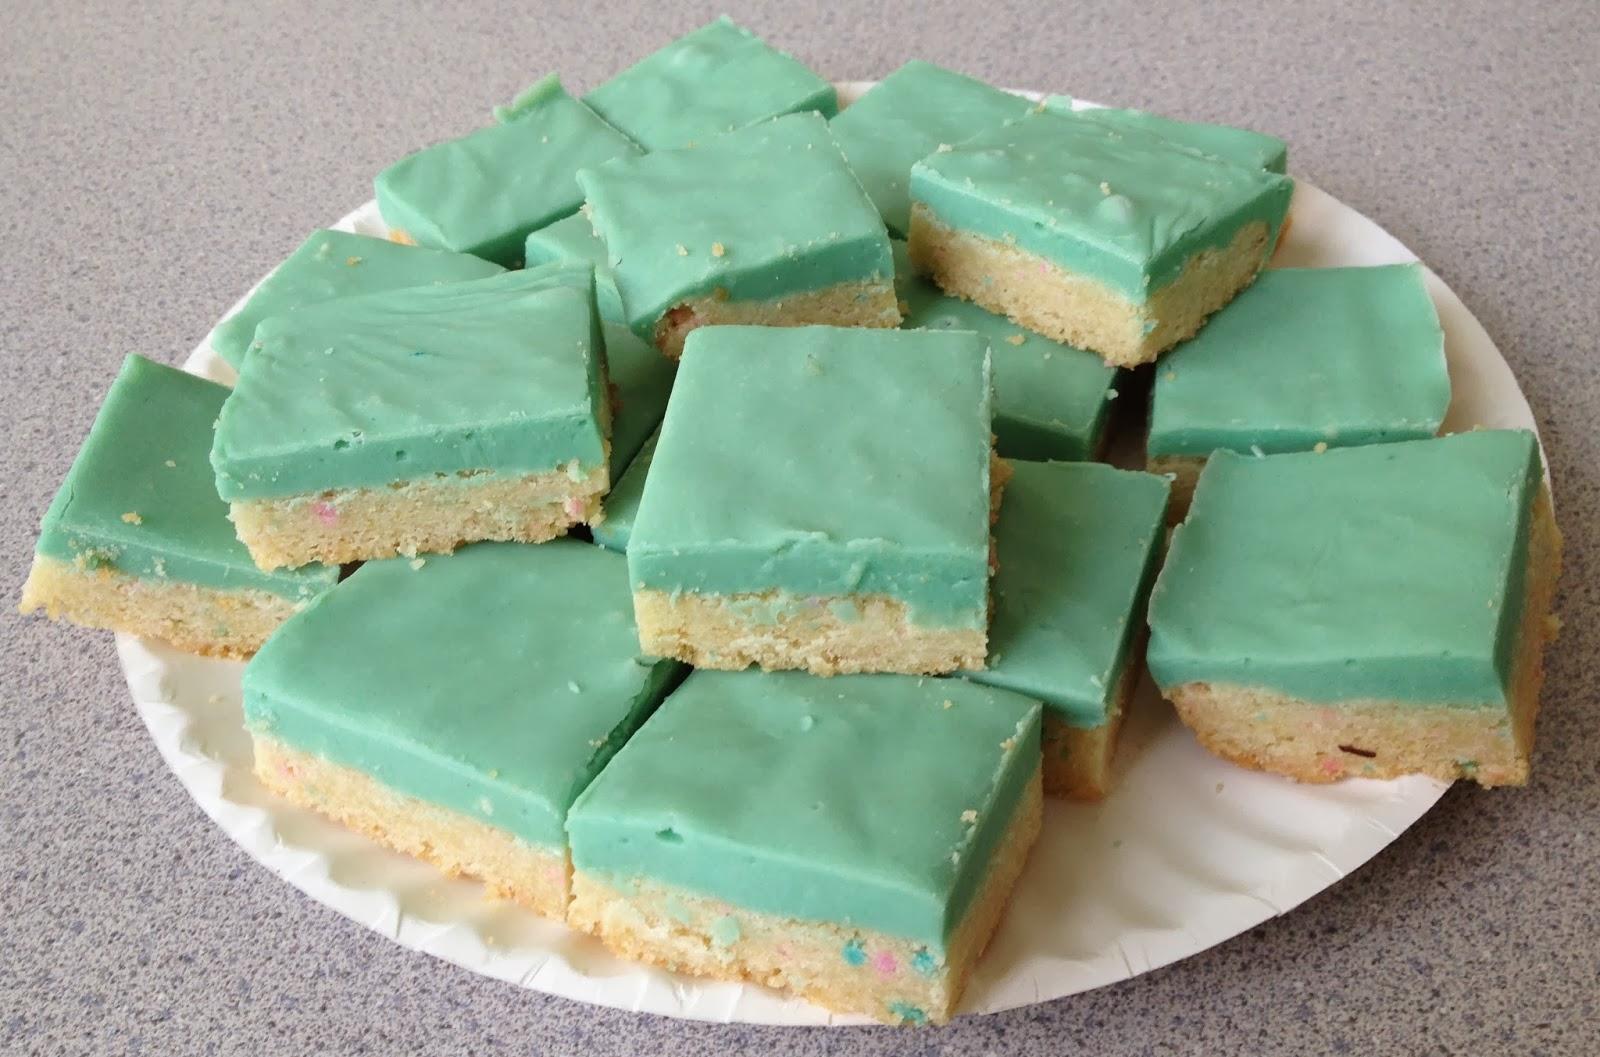 the knitlit twit: Cubicle kitchen: Cotton Candy Cookie Fudge Bars